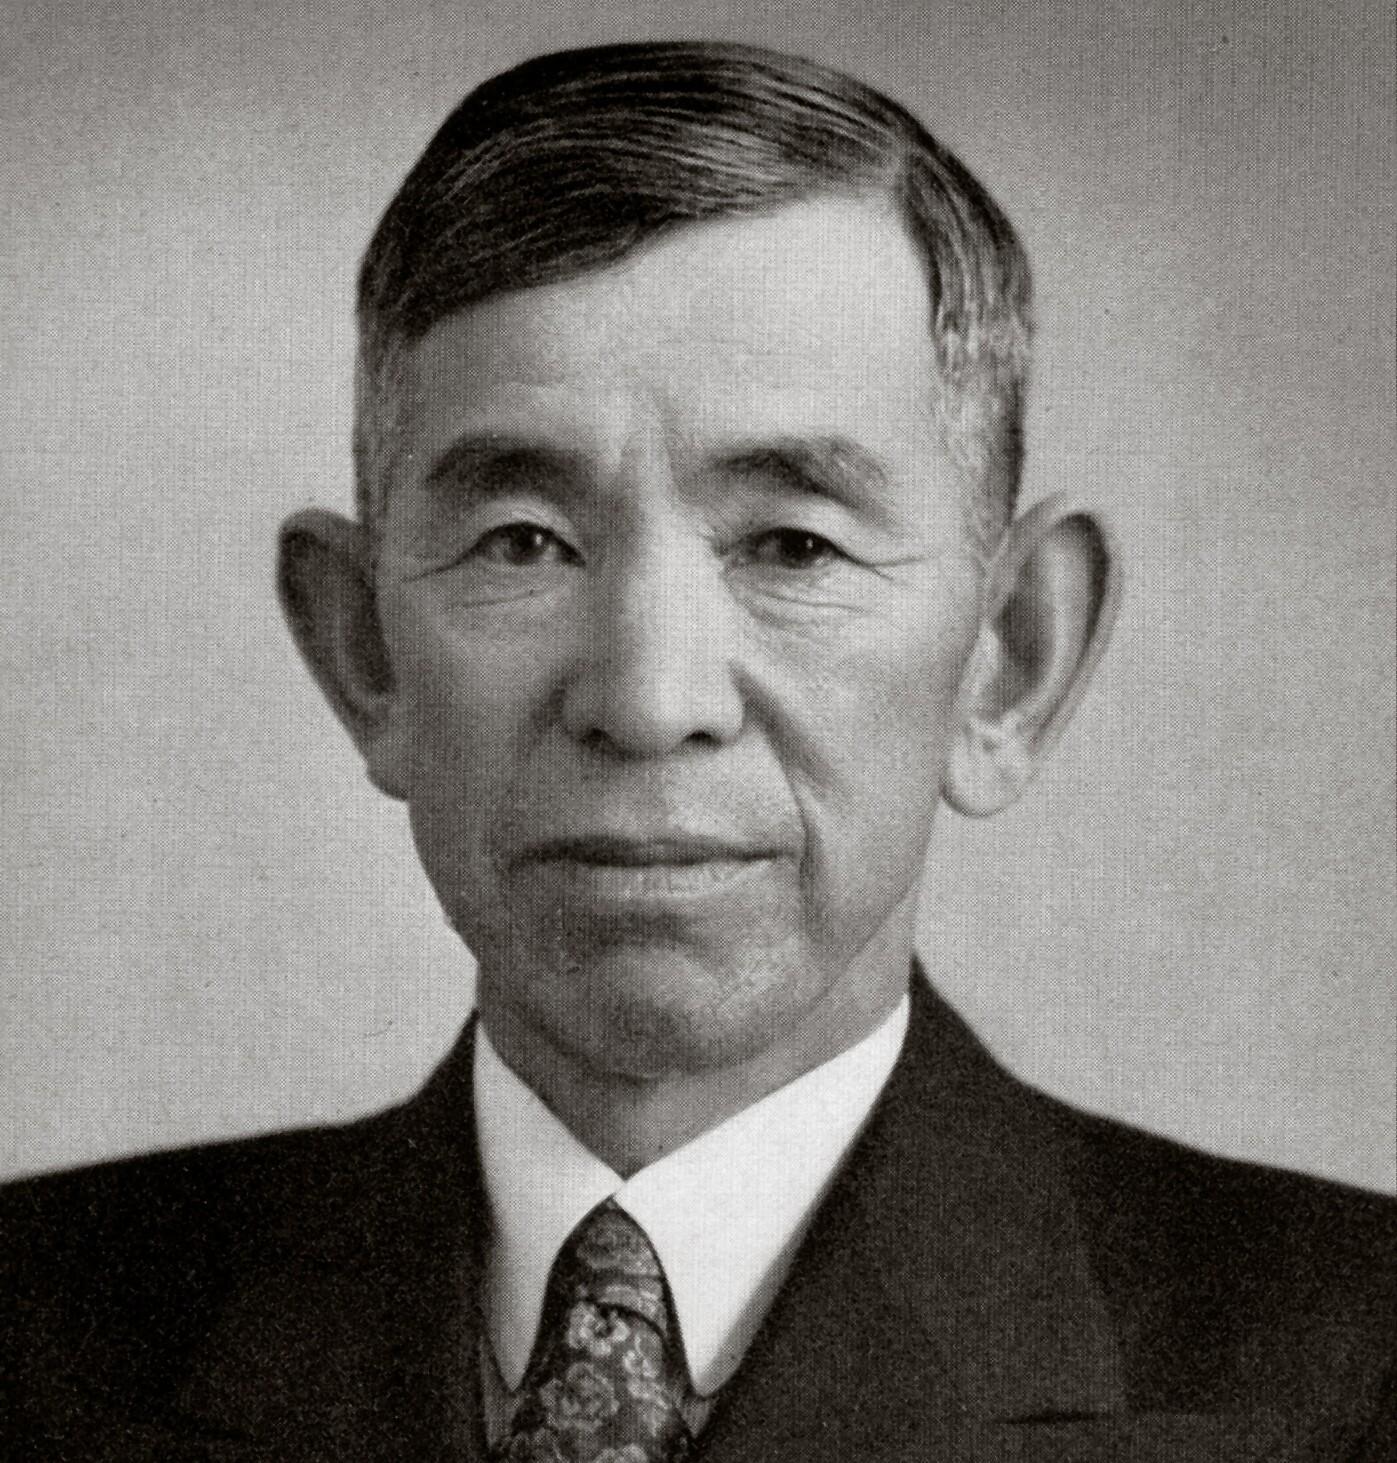 F.M. Uyematsu, Star Nursery proprietor